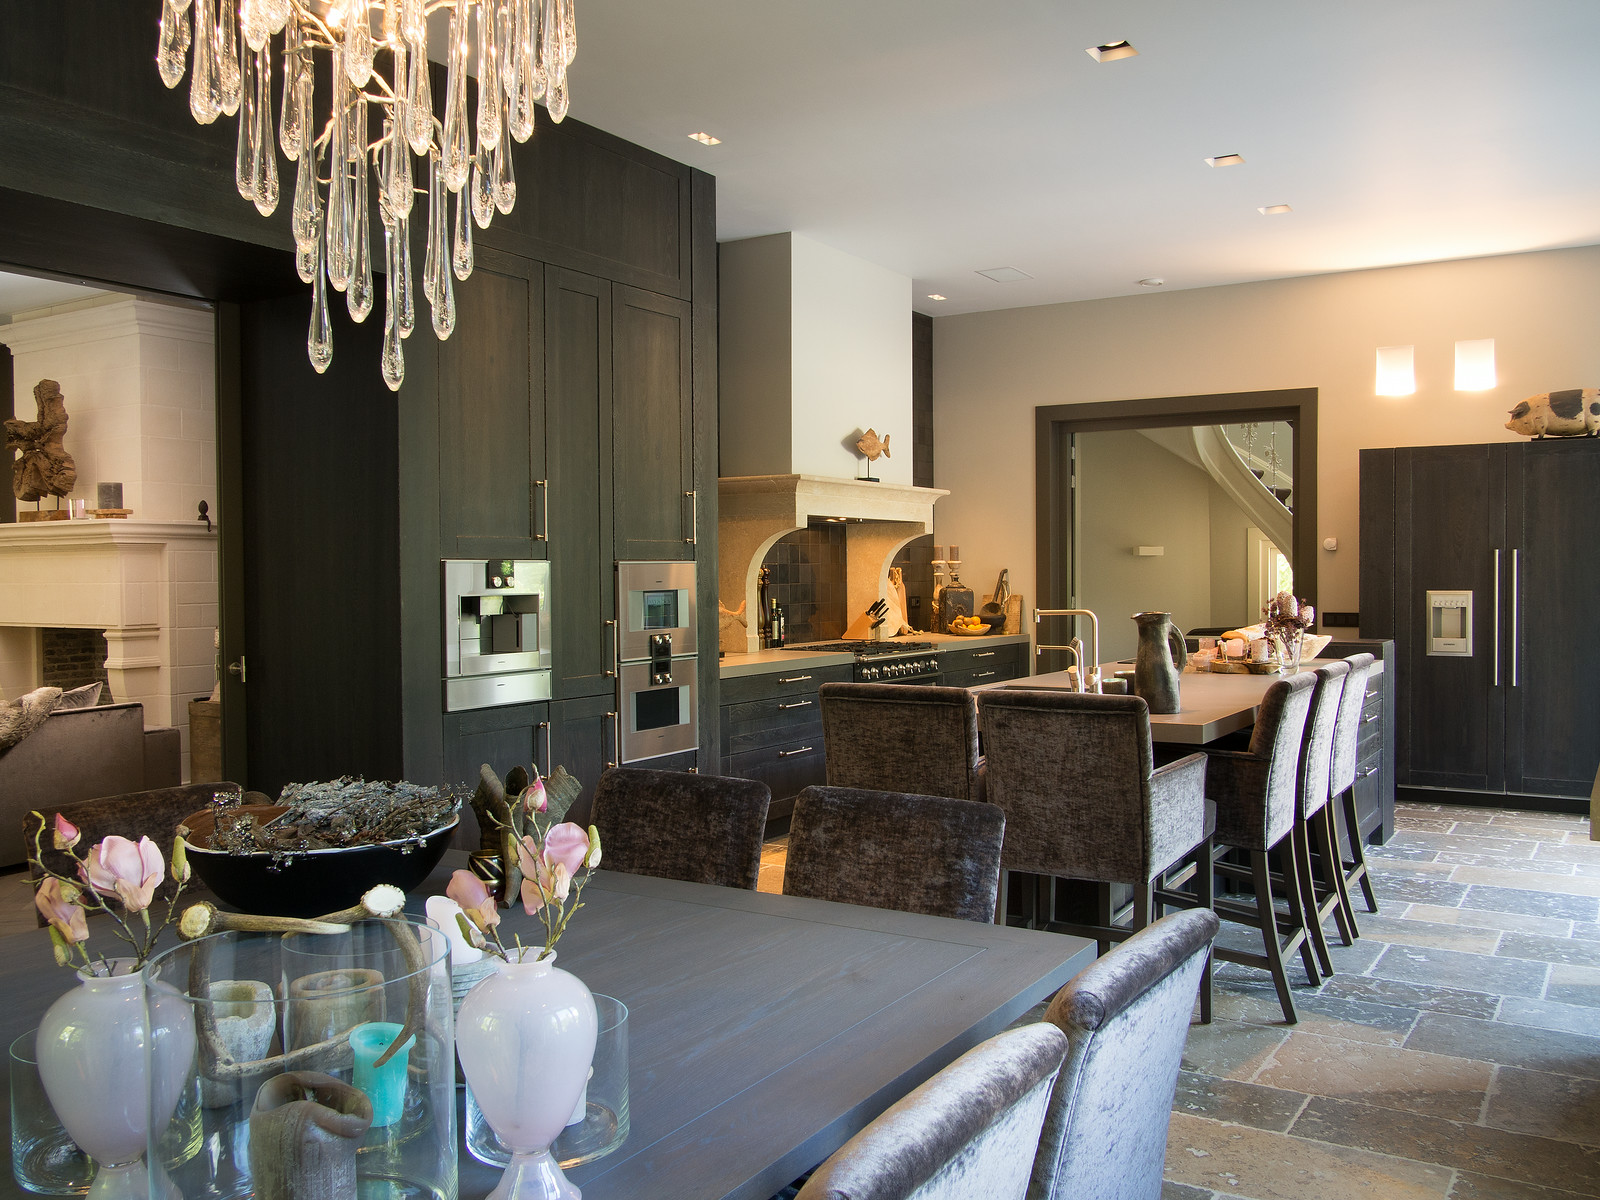 Boretti Keuken Dealers : Keukens in MIDDELHARNIS Startpagina voor keuken idee?n UW-keuken.nl